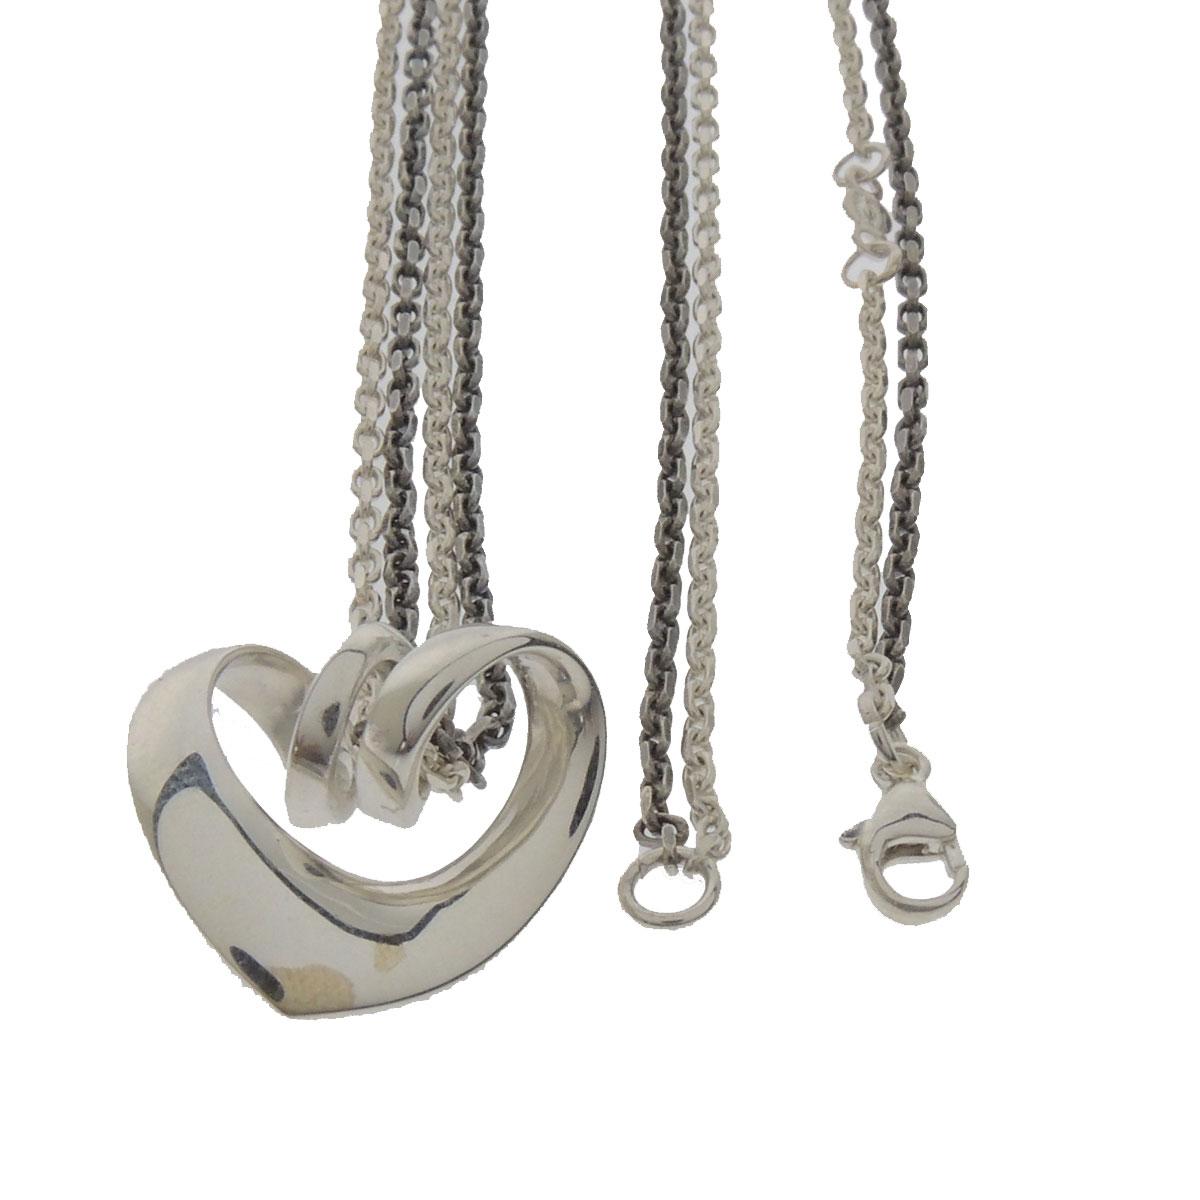 Georg Jensen heart motif double chain necklace - ladies fs3gm